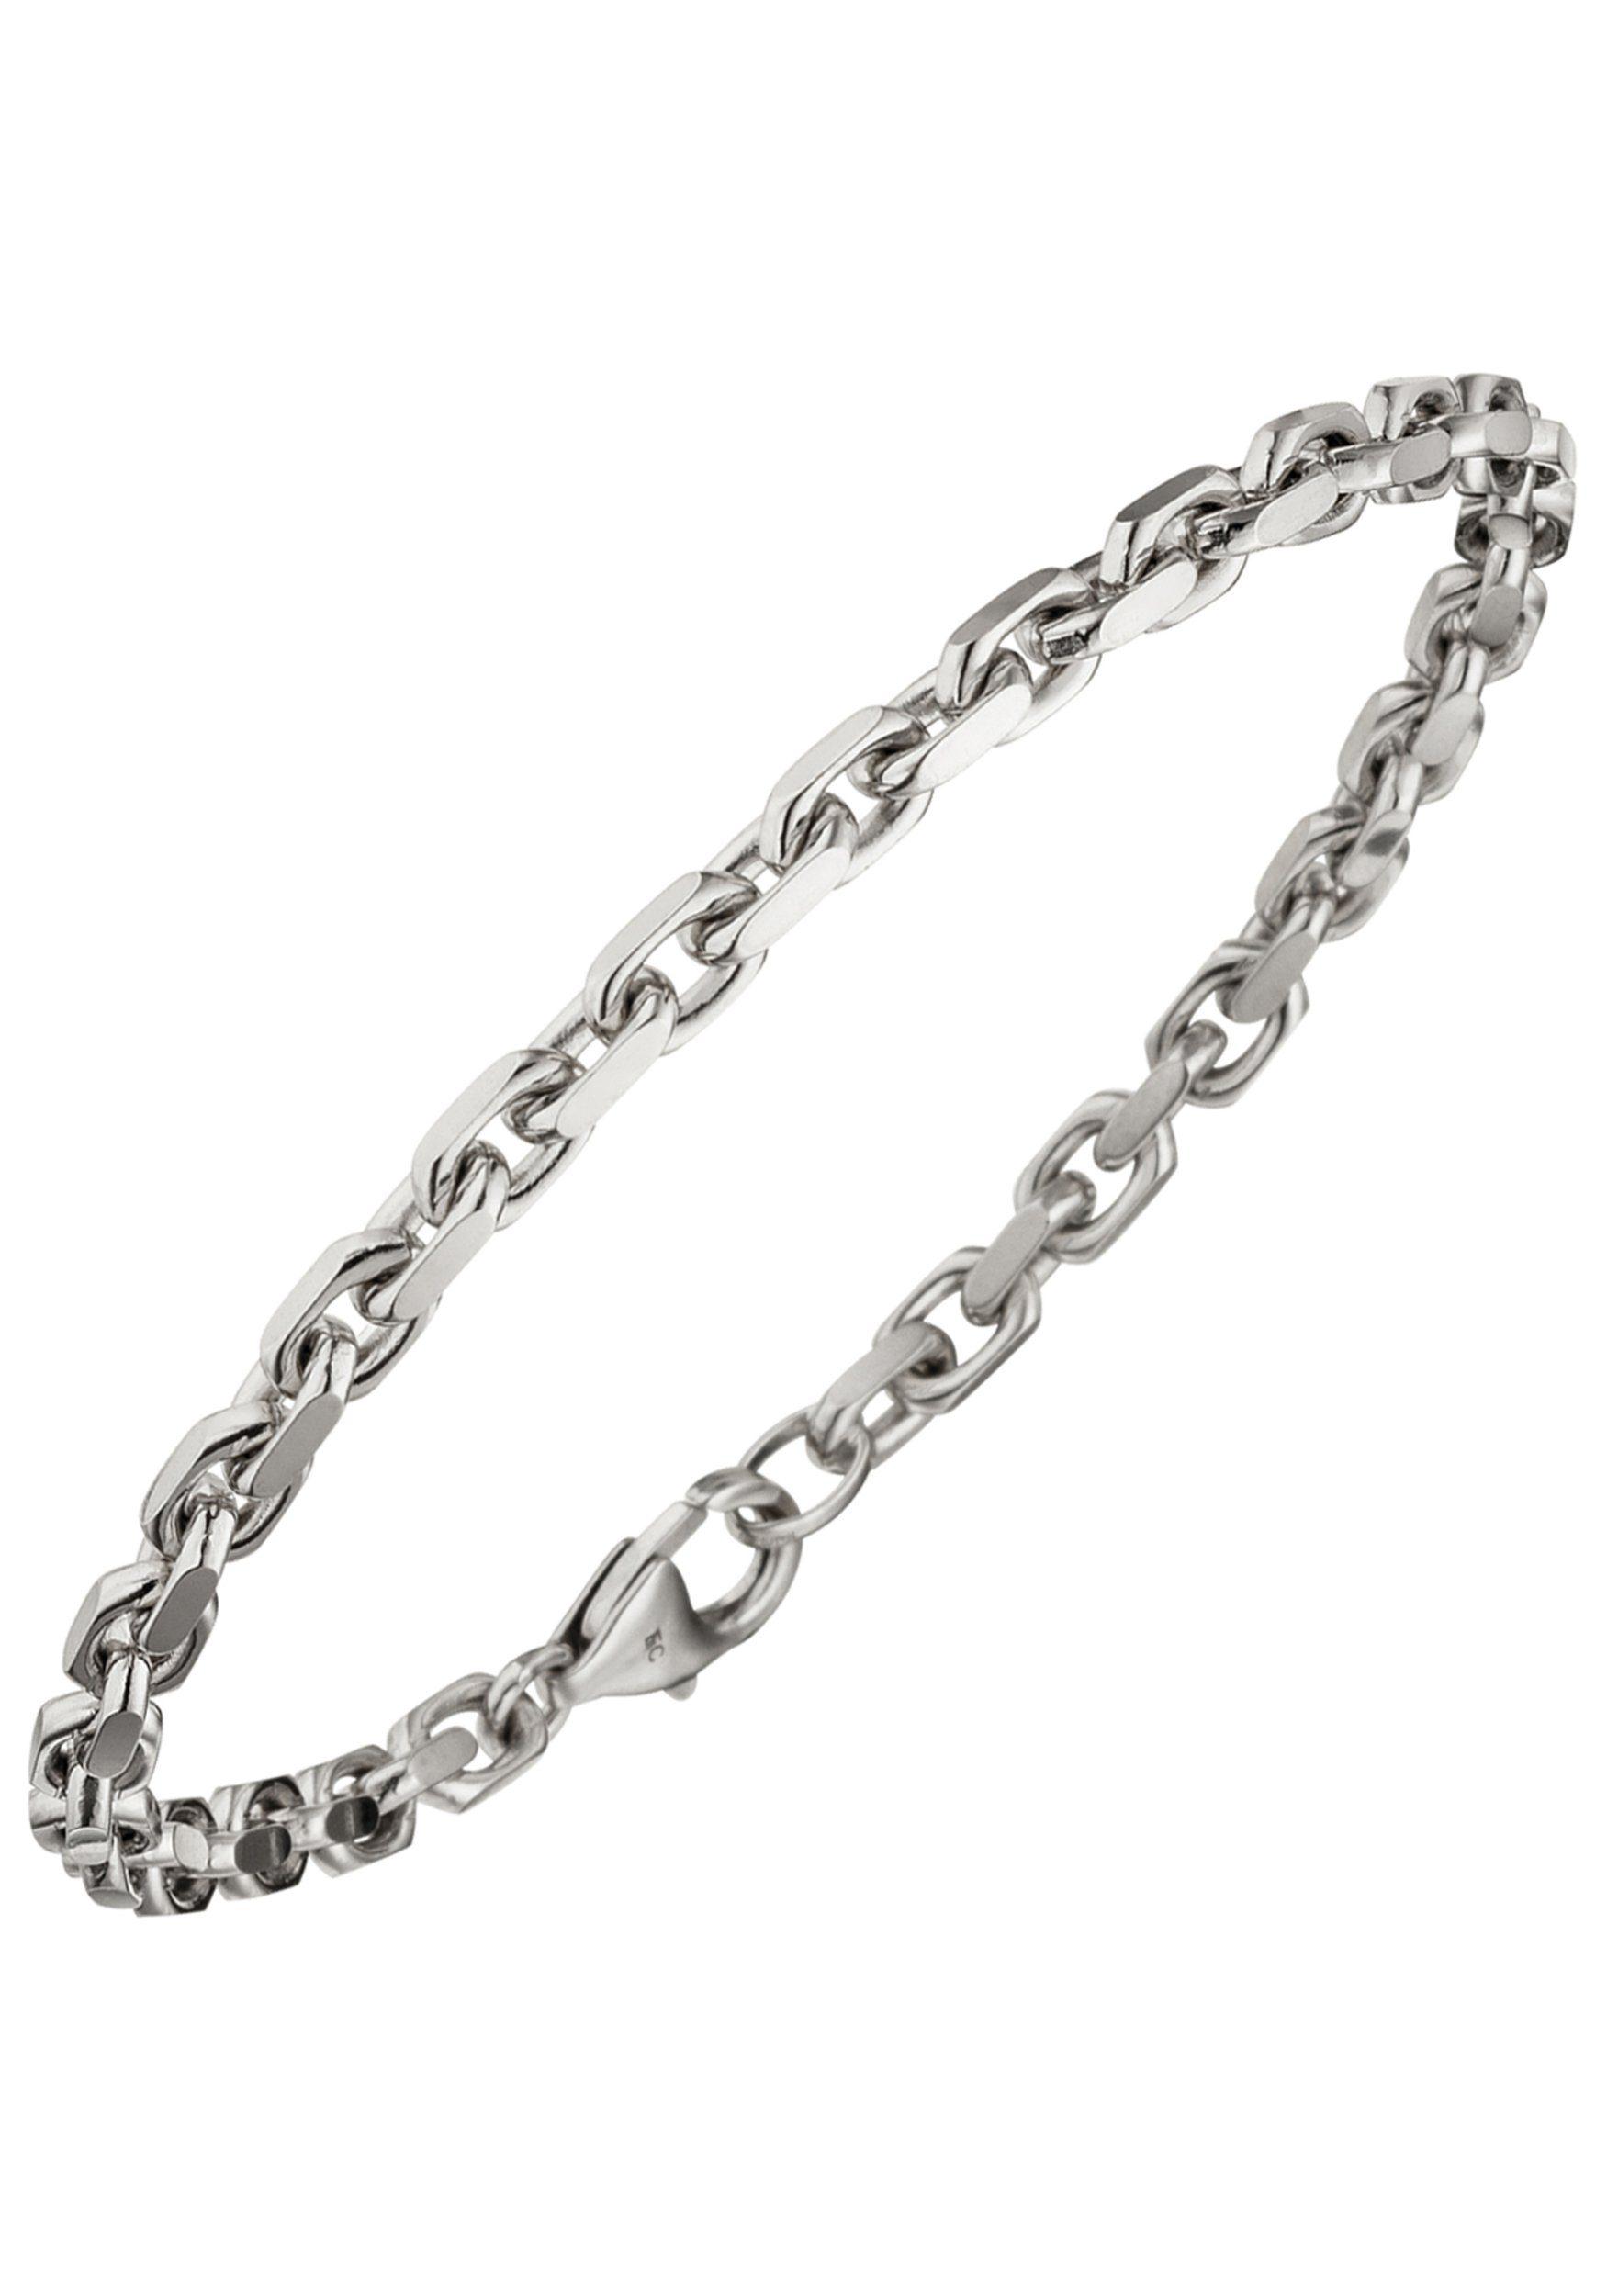 JOBO Goldarmband Ankerarmband 585 Weißgold diamantiert 21 cm